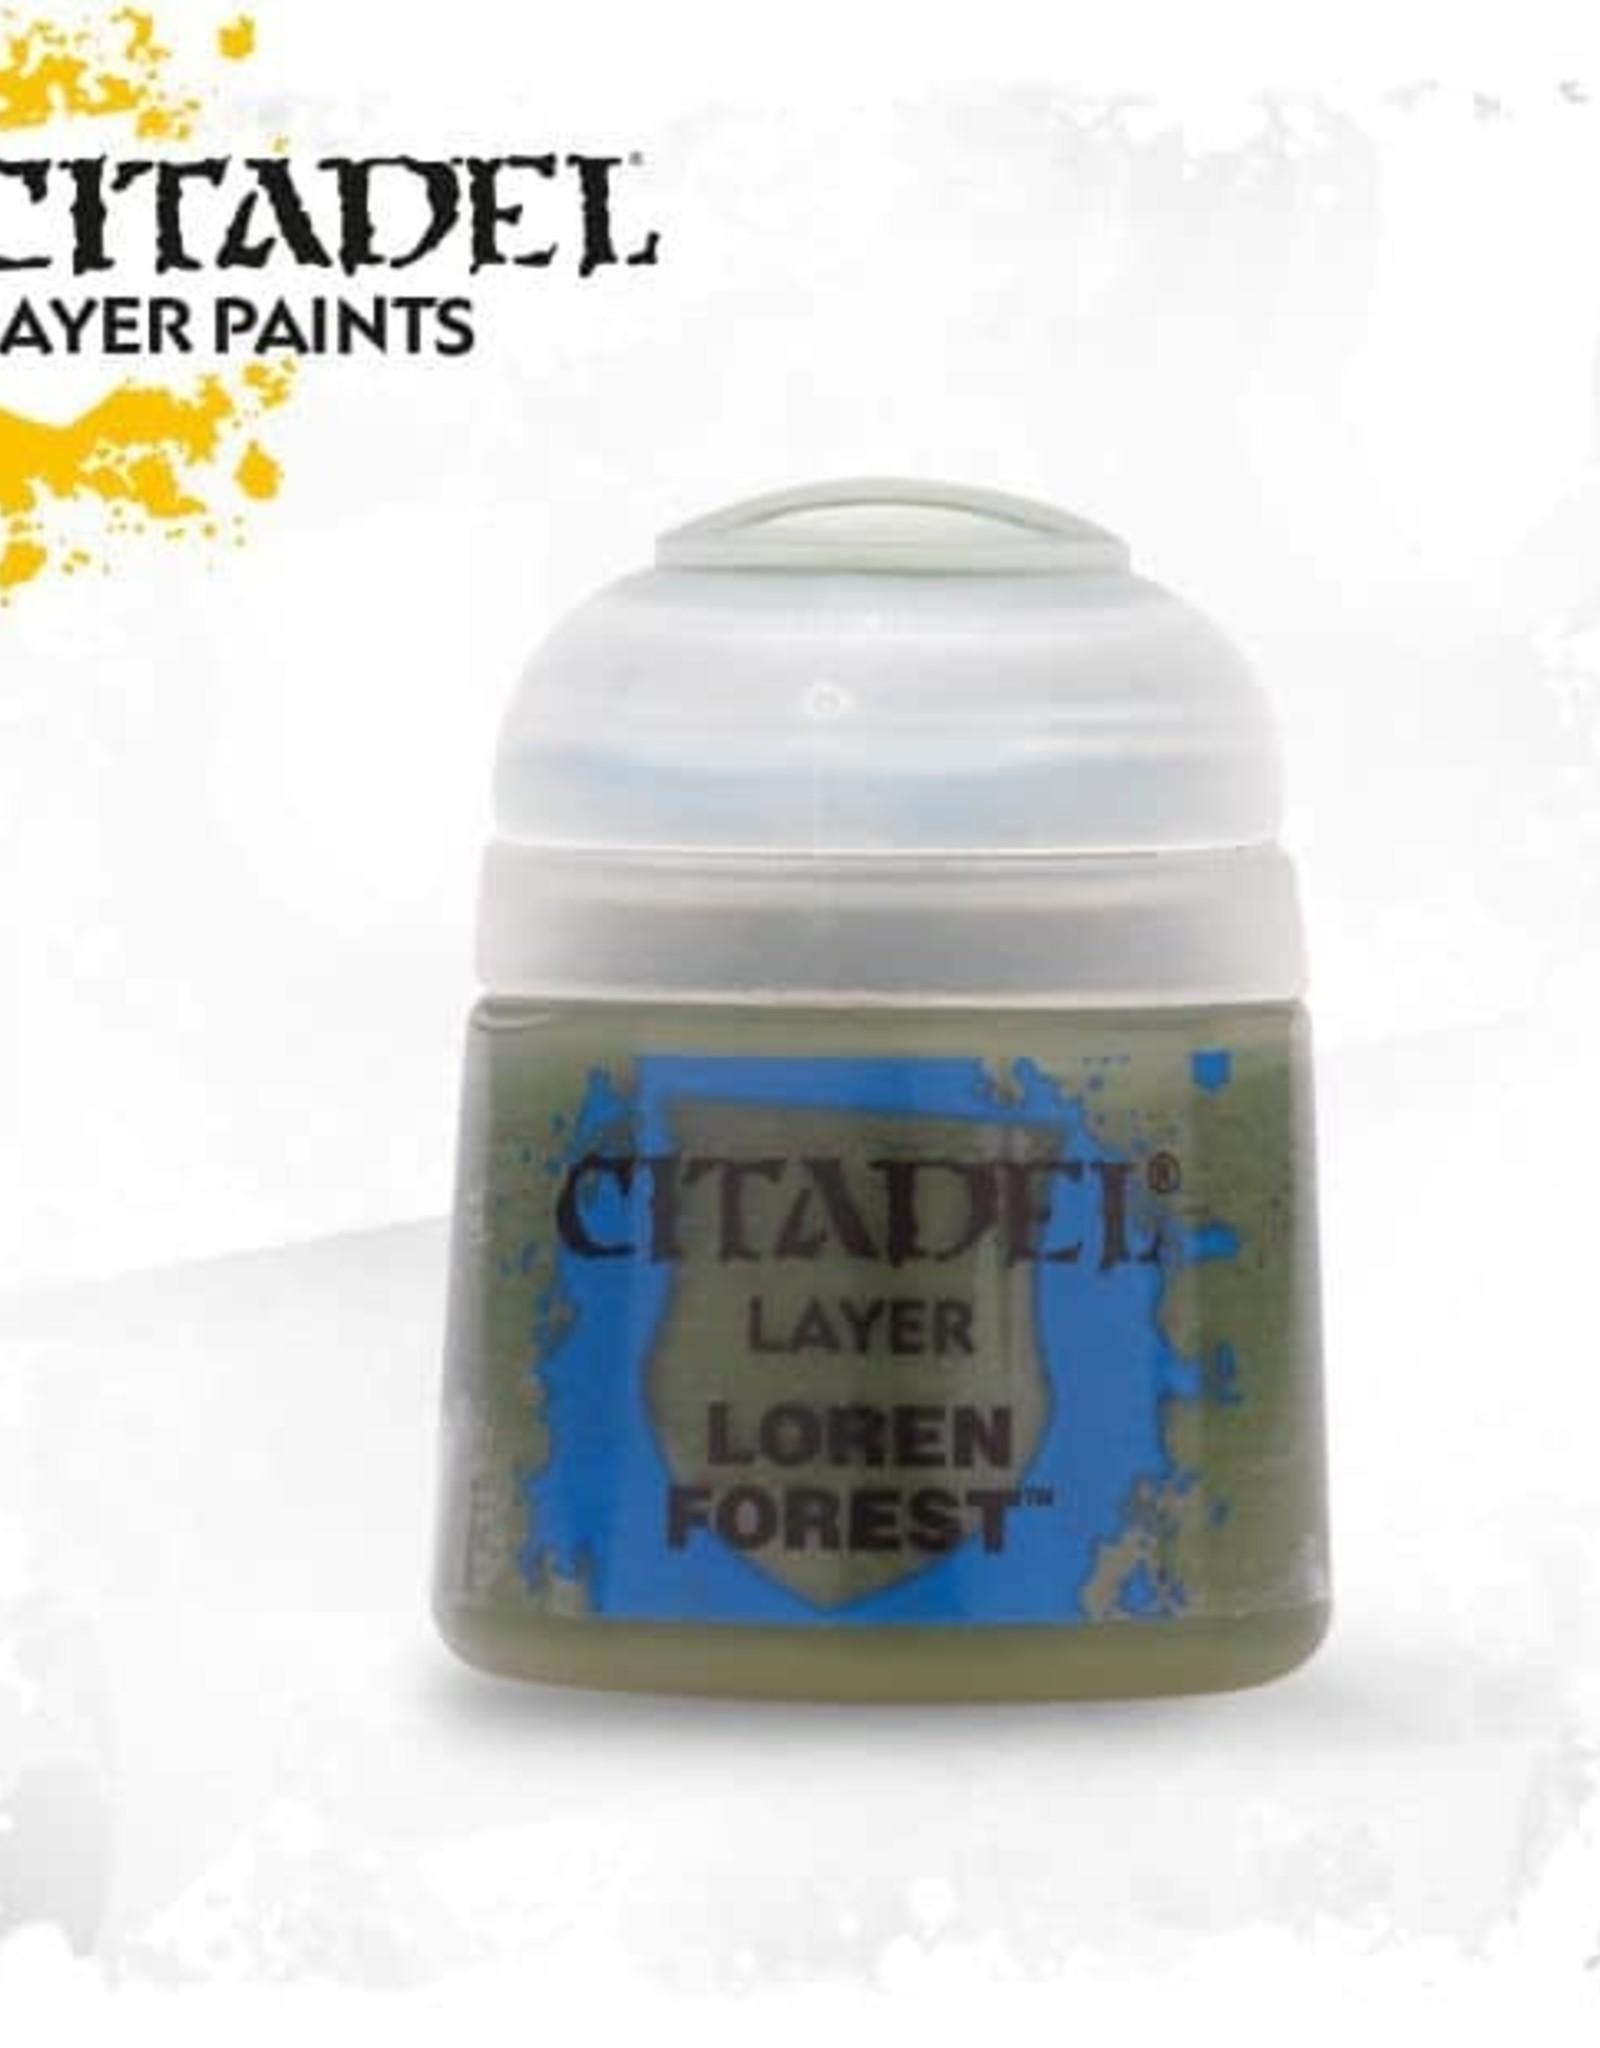 Games Workshop Citadel Paint: Layer - Loren Forest